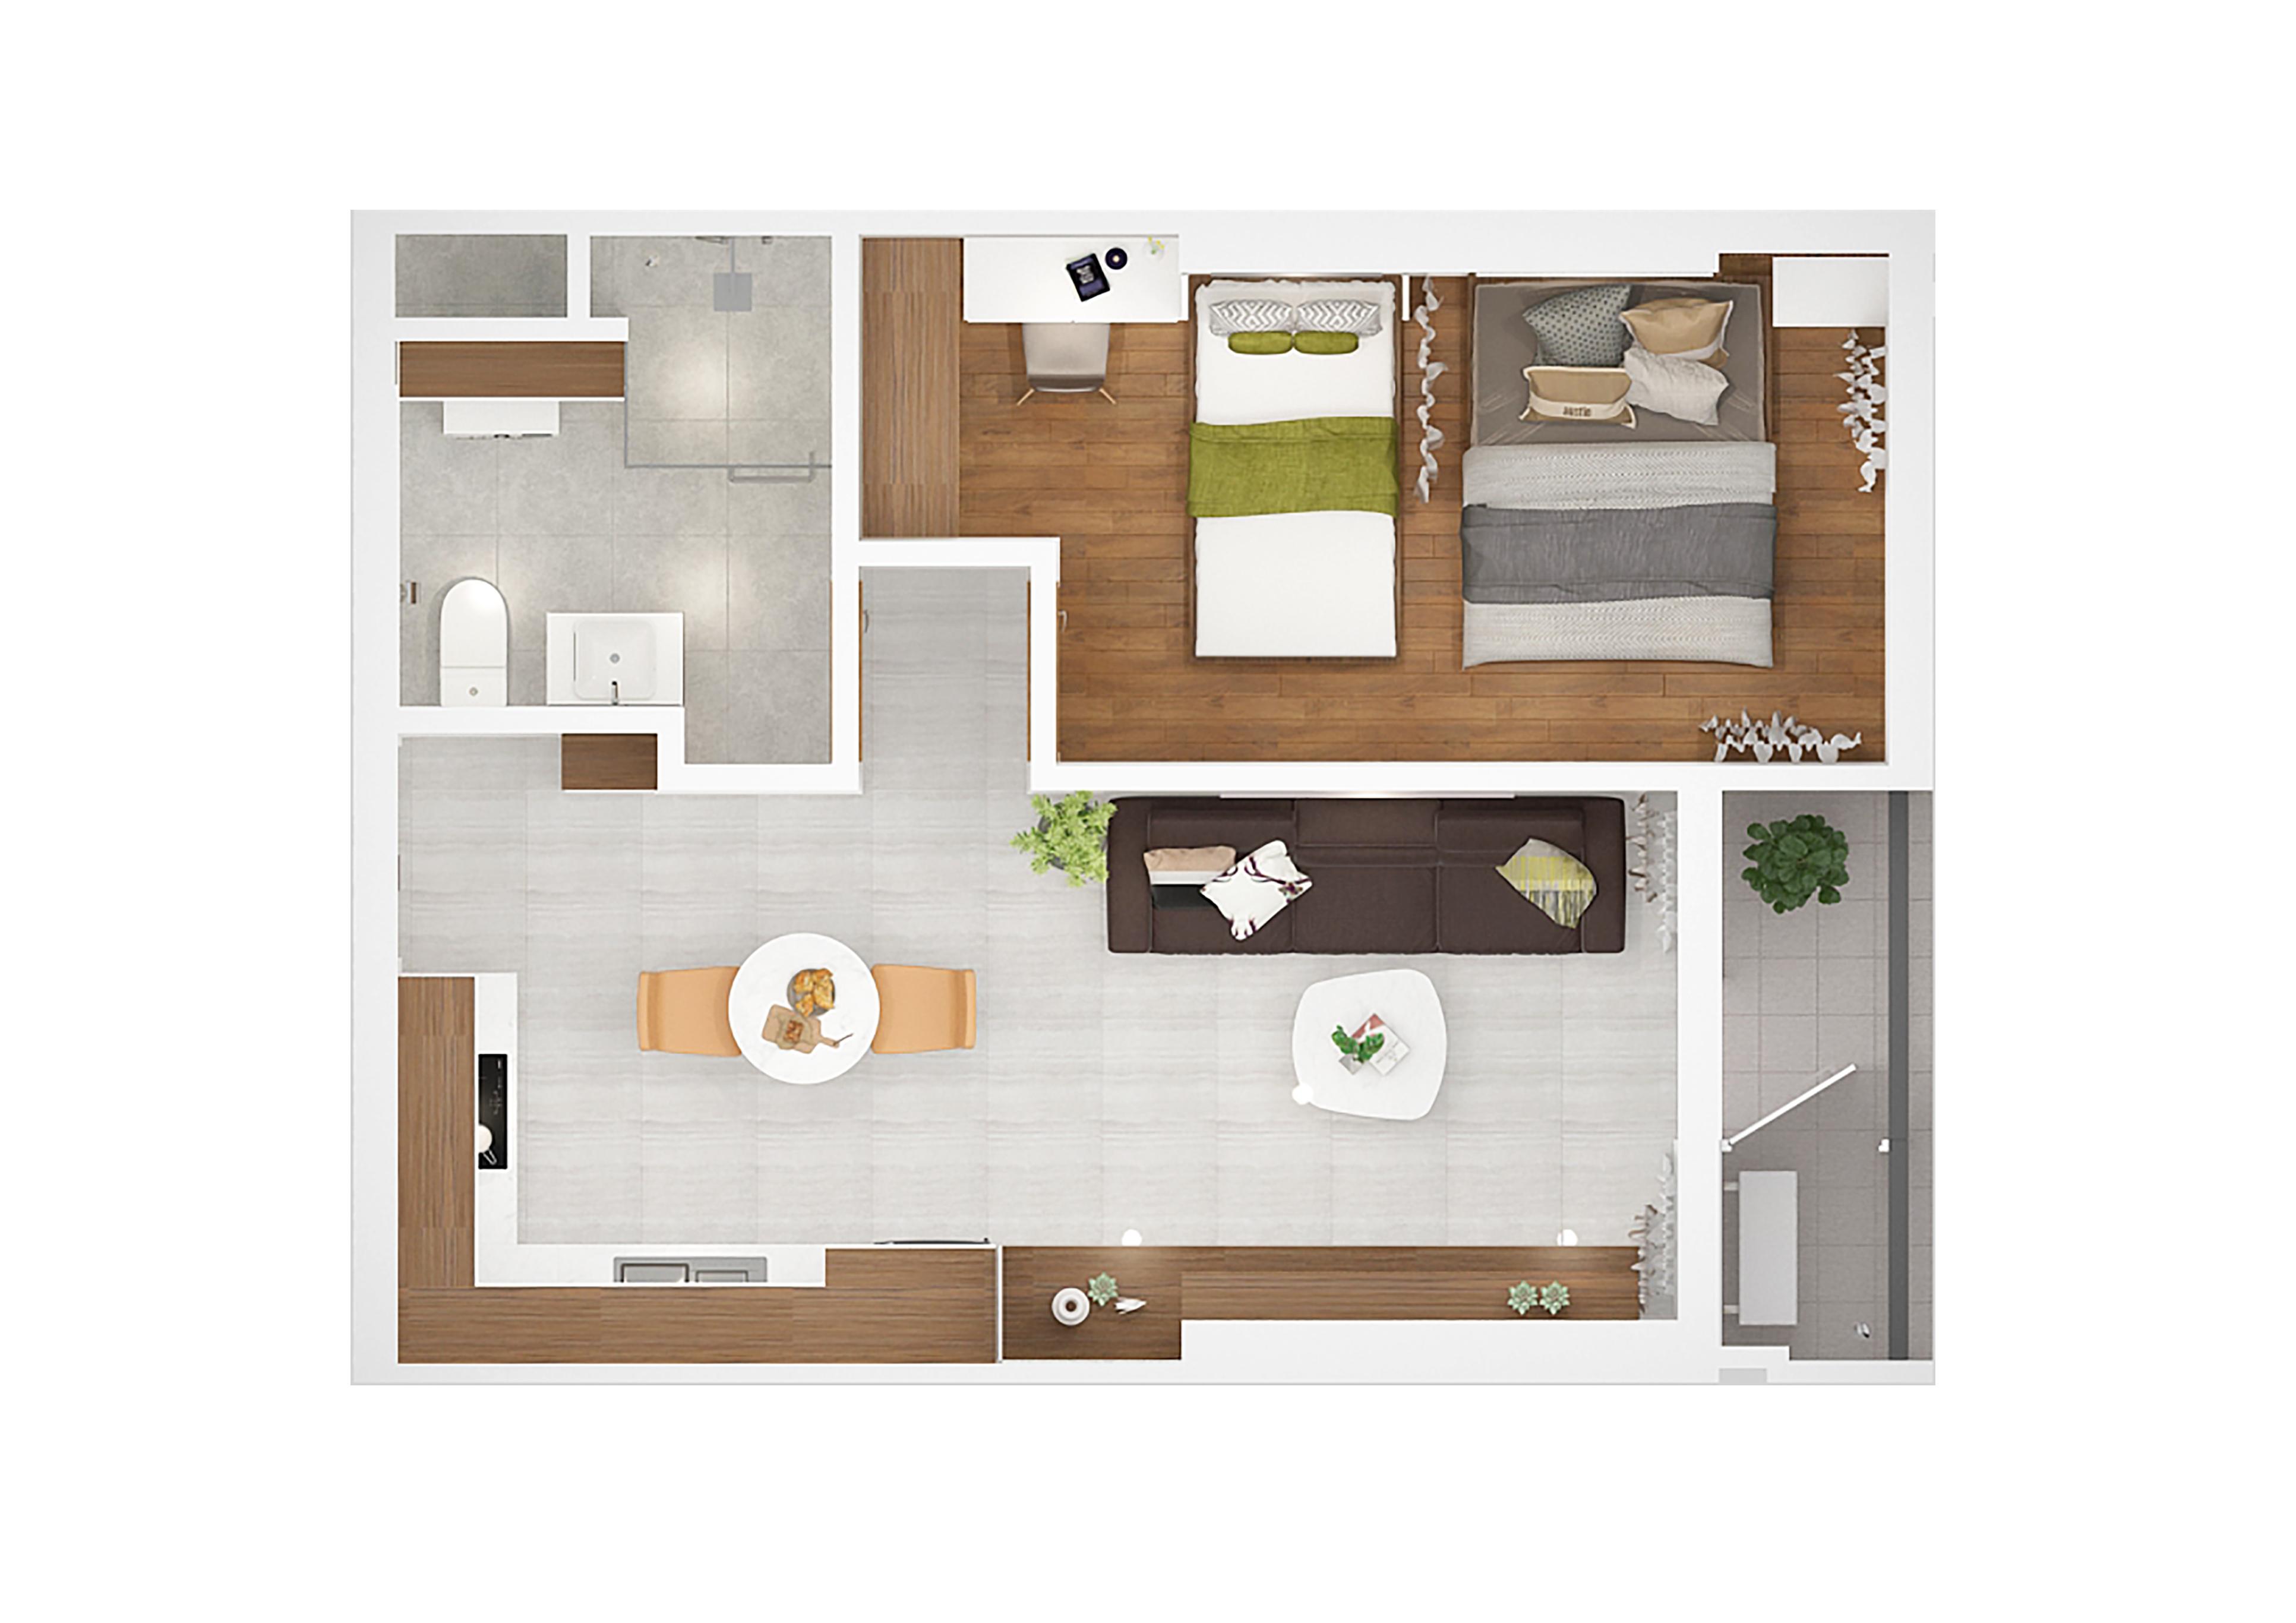 Mẫu căn hộ Kingdom 101 diện tích 48m2